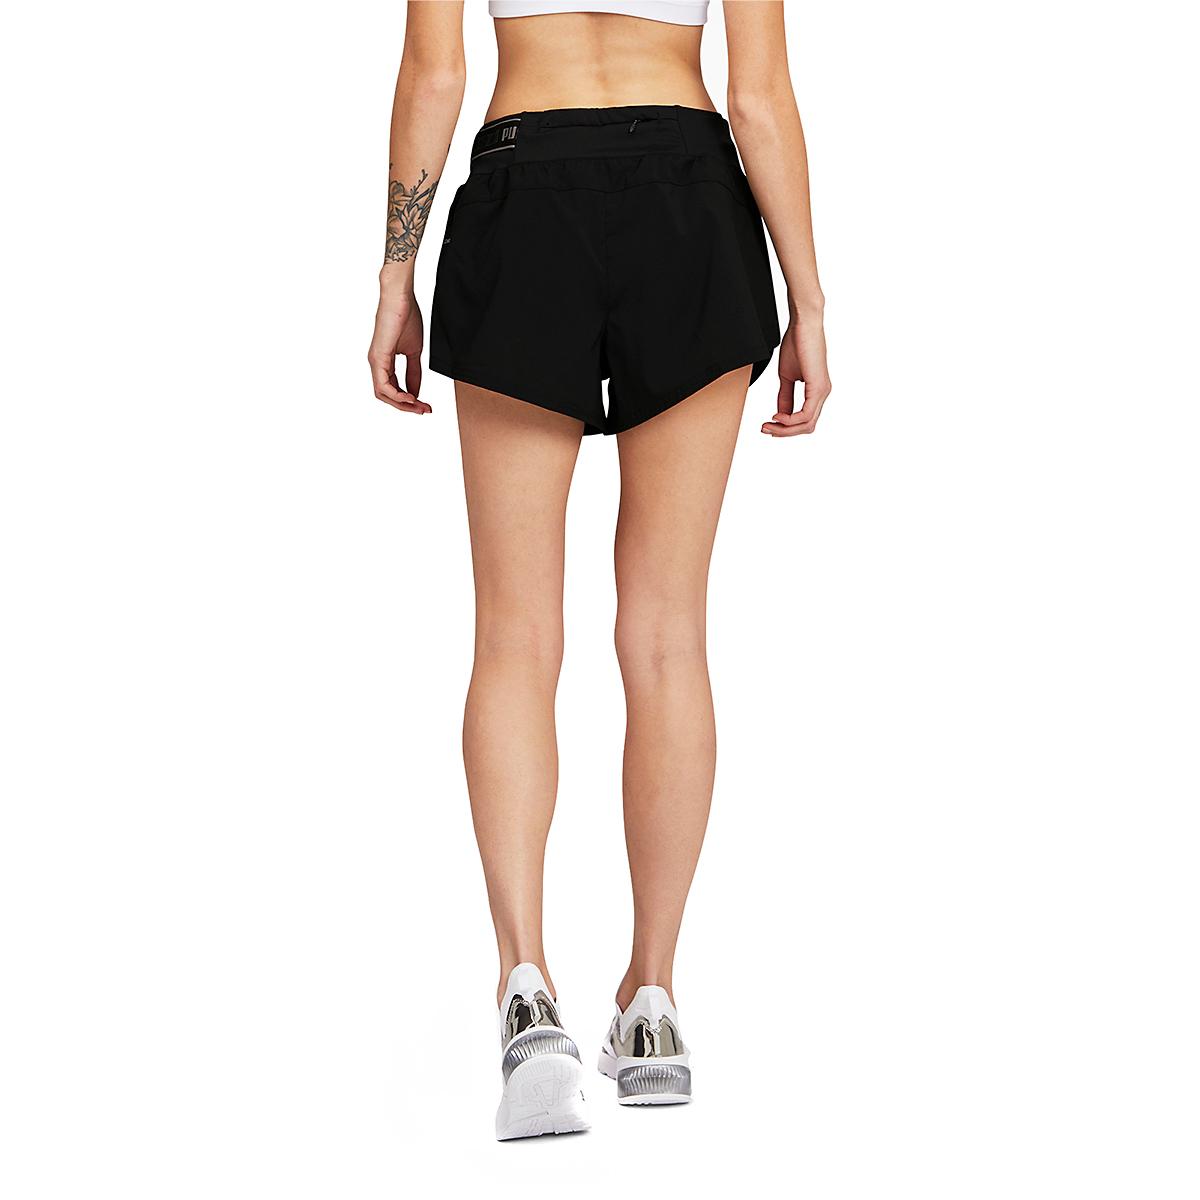 "Women's Puma COOLadapt 3"" Running Shorts - Color: Puma Black - Size: XS, Puma Black, large, image 2"